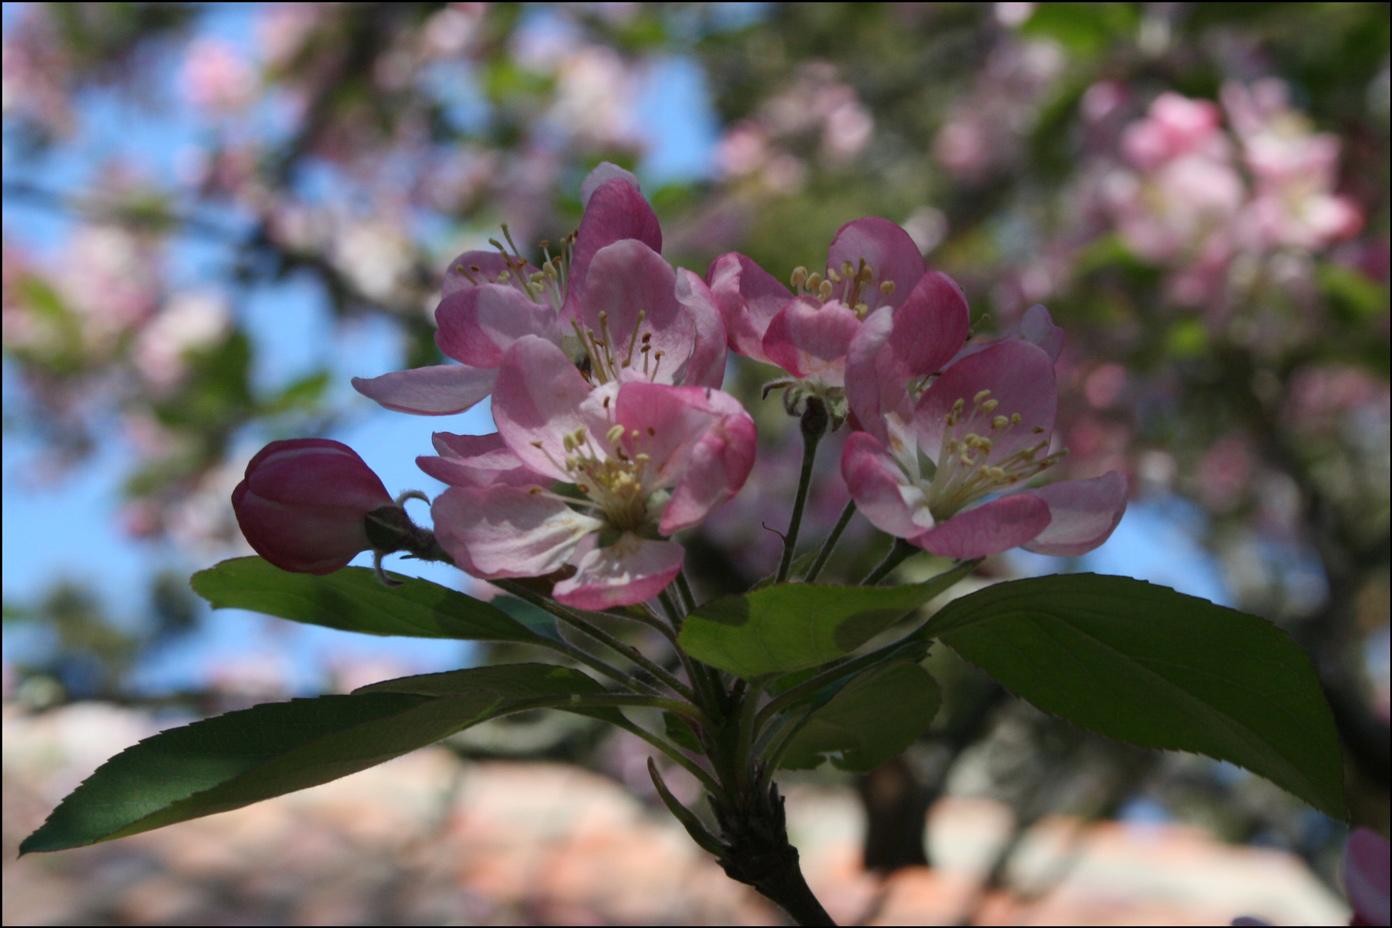 Malus floribunda - Showy Crabapple